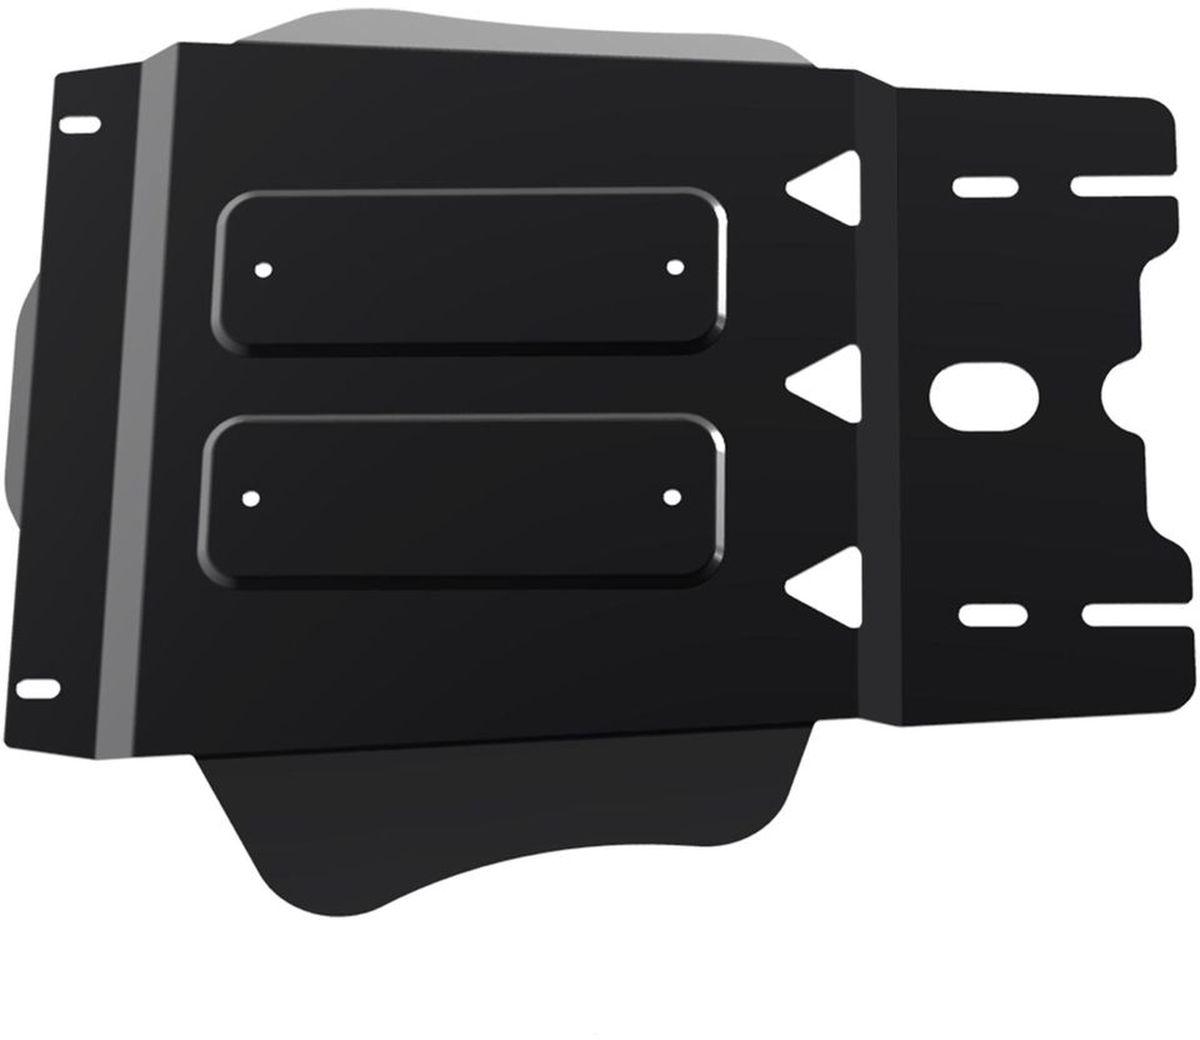 Защита КПП Автоброня Chevrolet Niva 2002-, сталь 2 мм